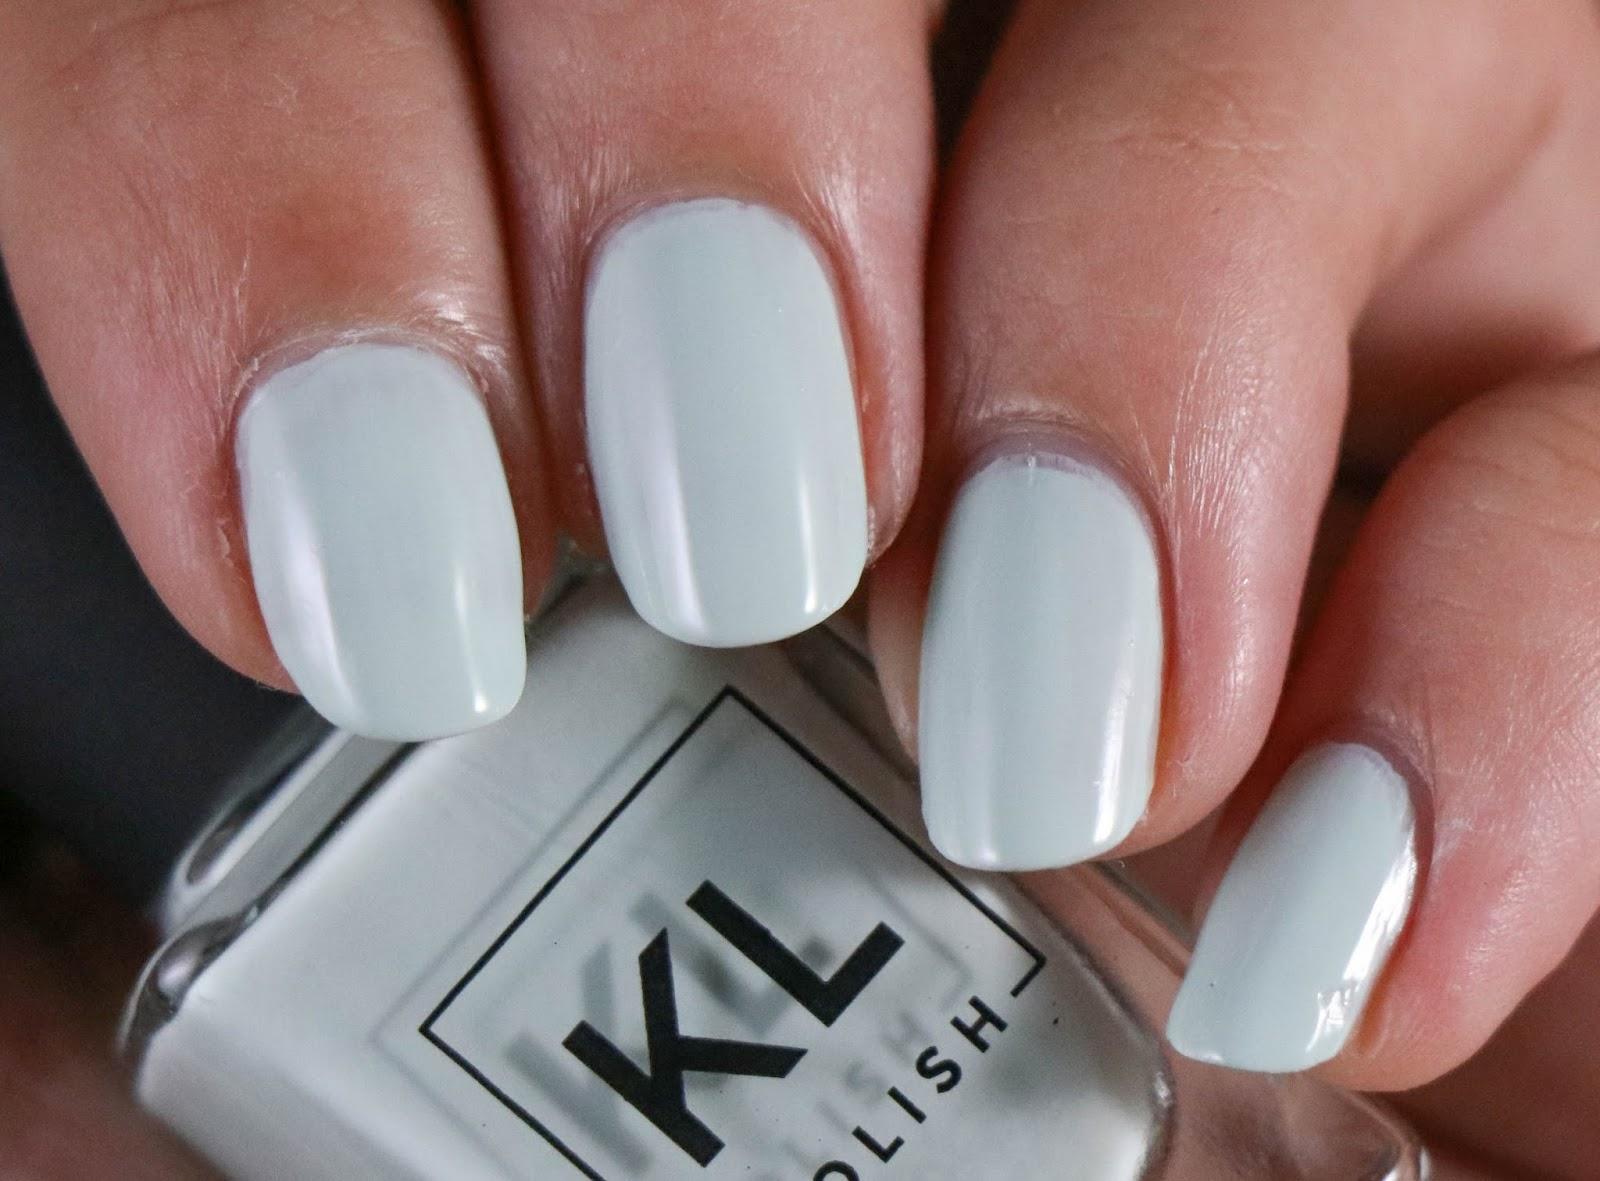 Zoya Naked Manicure Hydrate & Heal Retail Kit Review - JACKIEMONTT